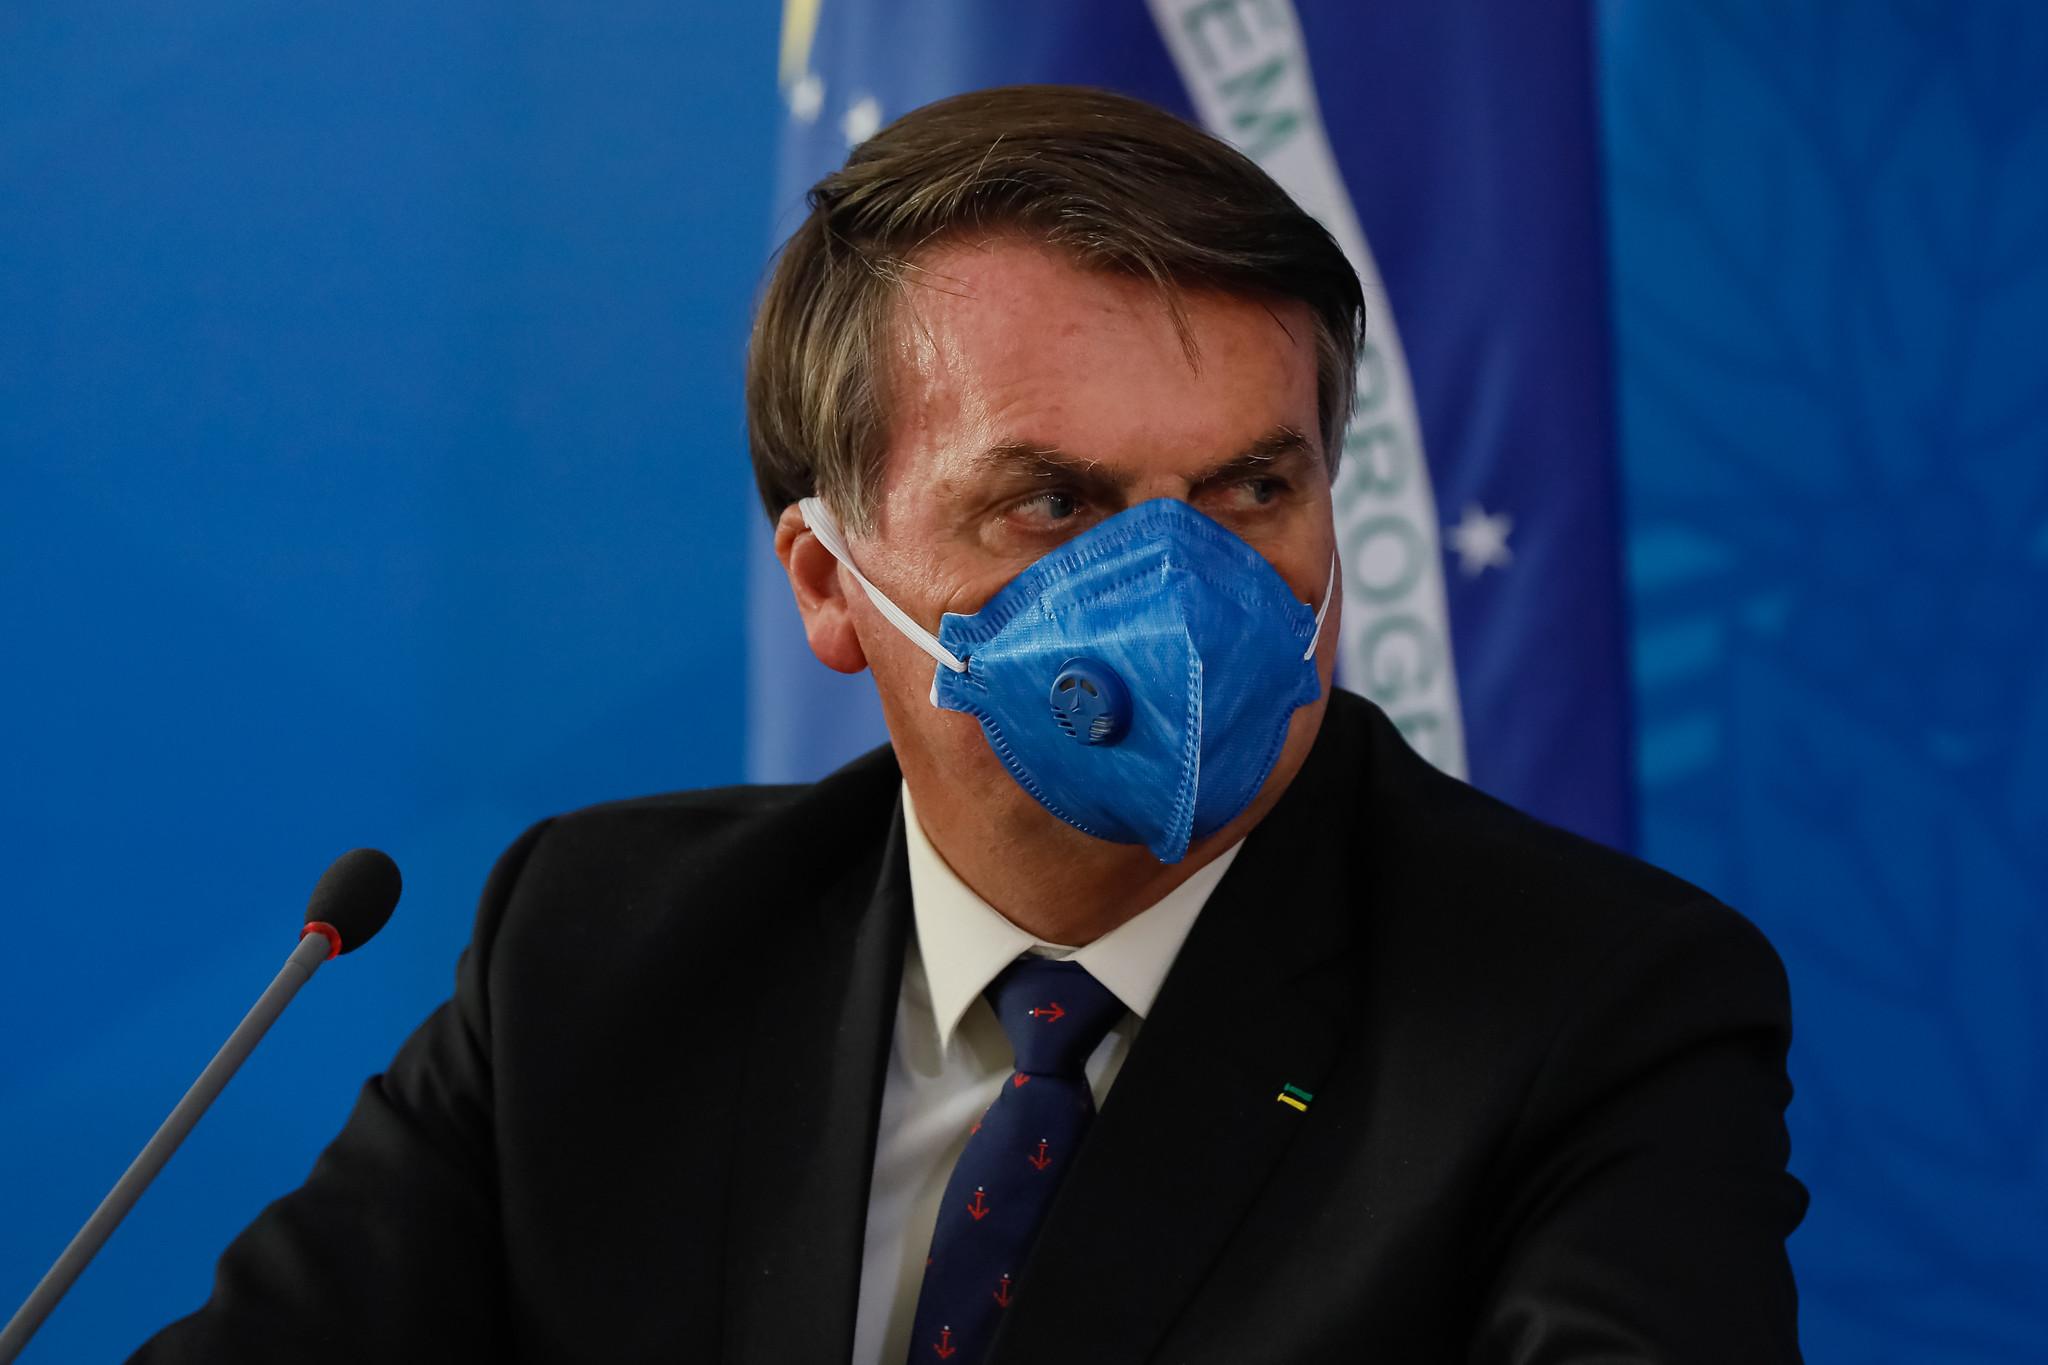 Coronavirus eats away at Bolsonaro's image